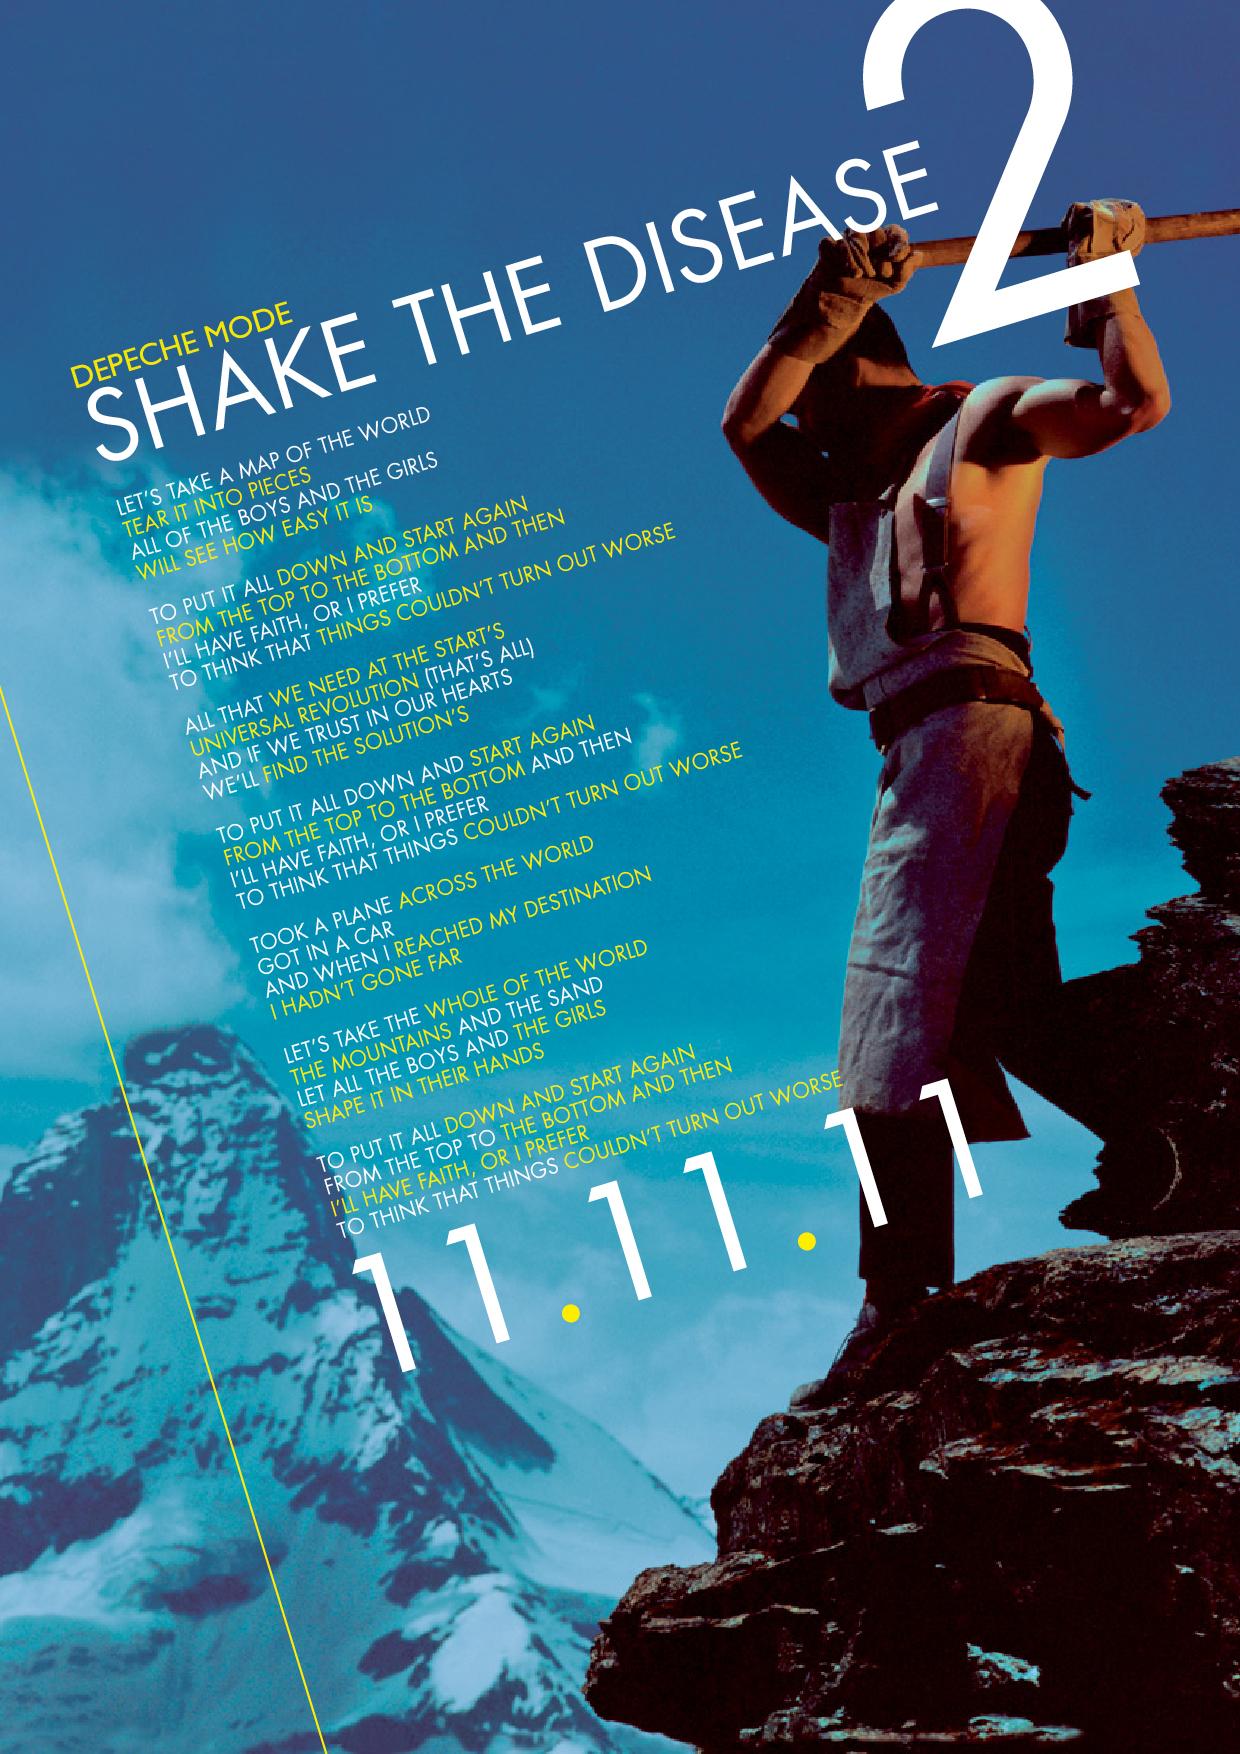 http://www.shakethedisease.fr/teasings/constructiontimeagain.jpg